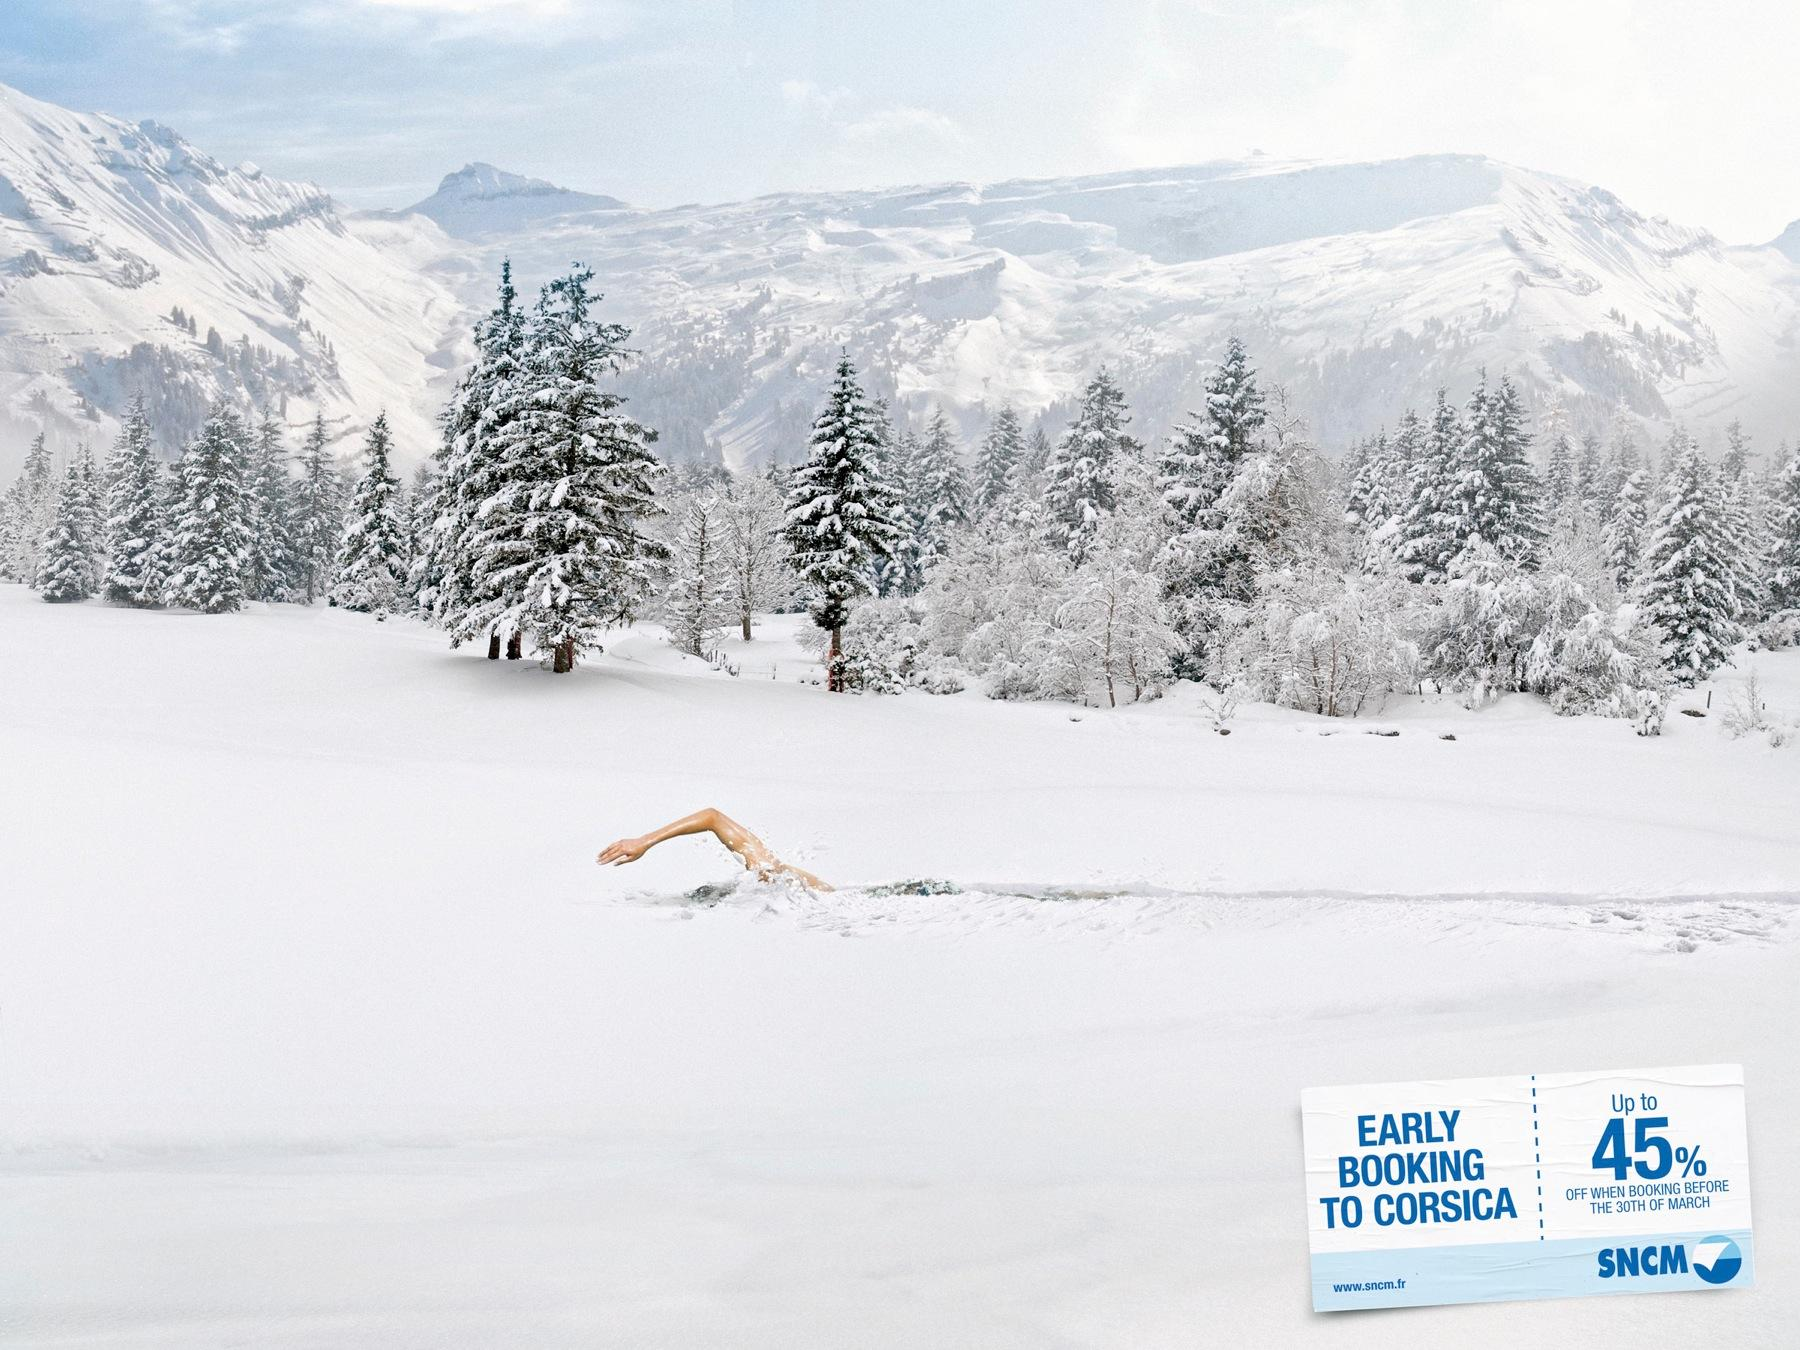 SNCM Print Ad -  The swimmer